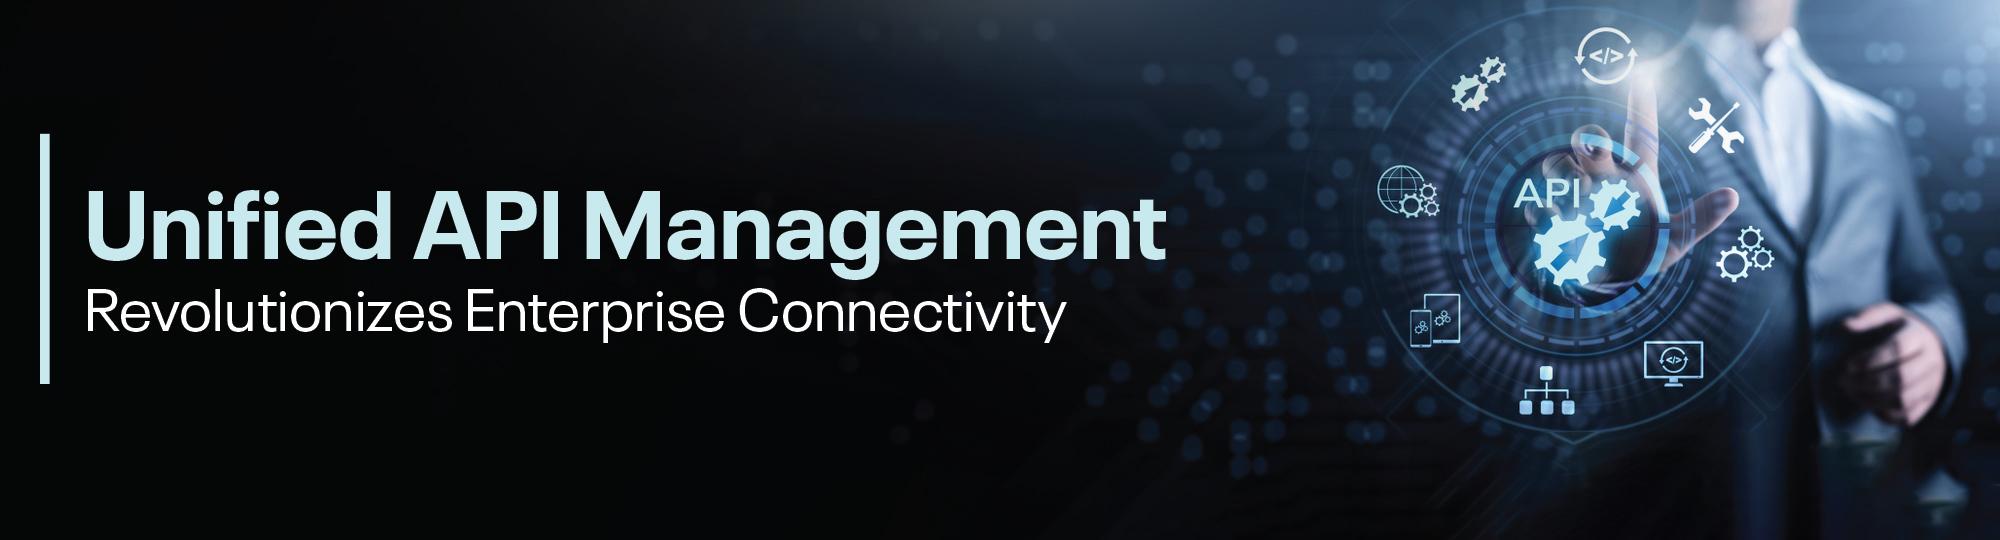 Strengthen Enterprise API and Cloud Strategies through Unified API Management Platform